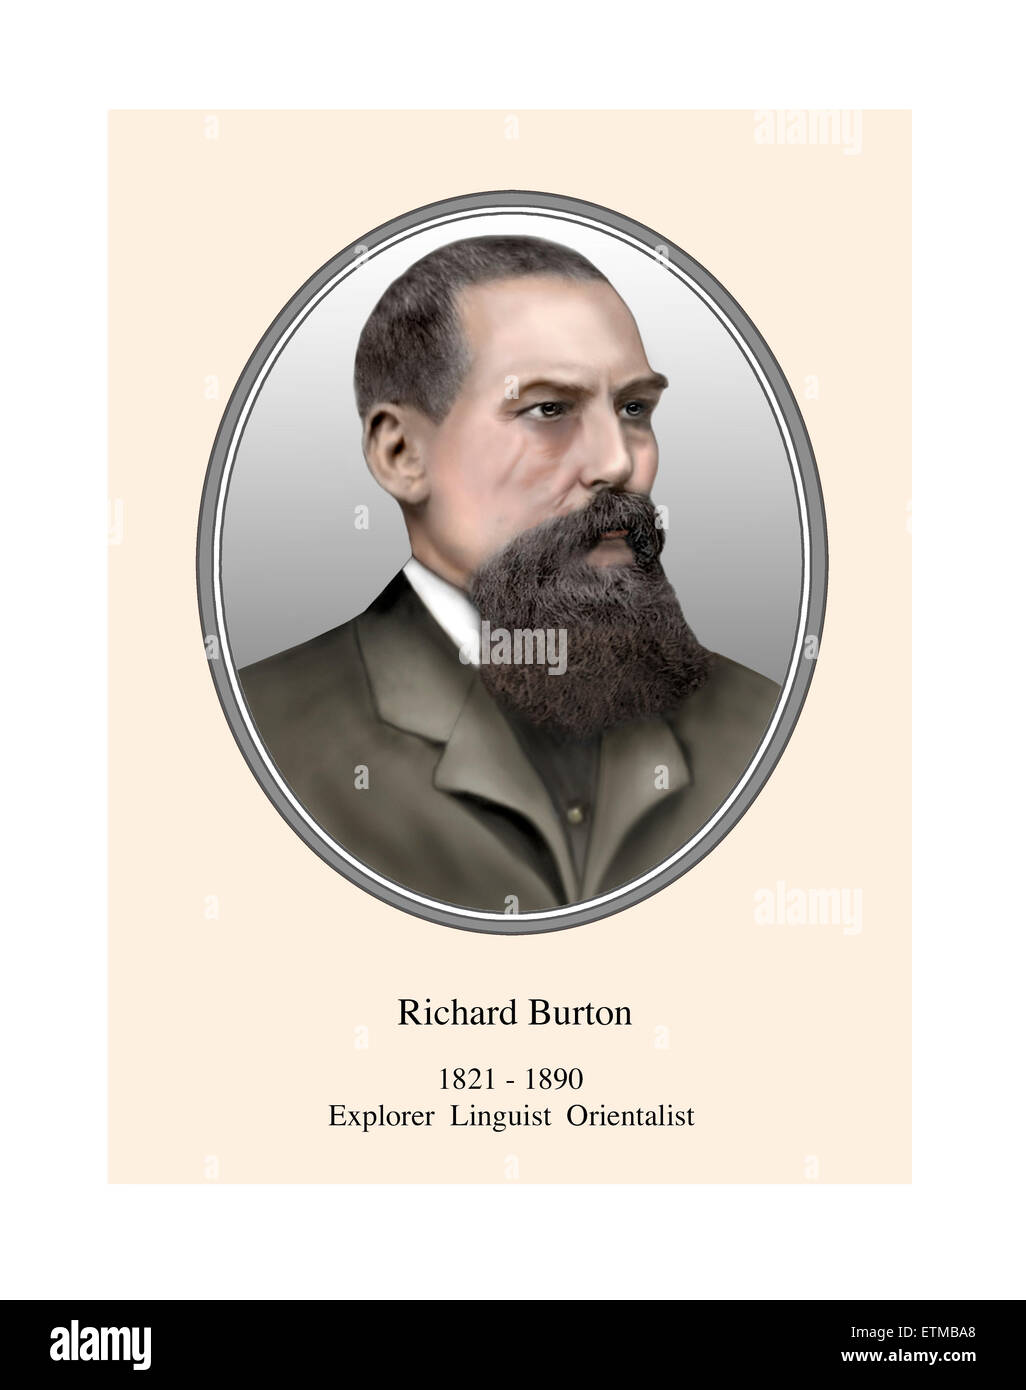 Richard Burton Portrait Imágenes De Stock & Richard Burton Portrait ...